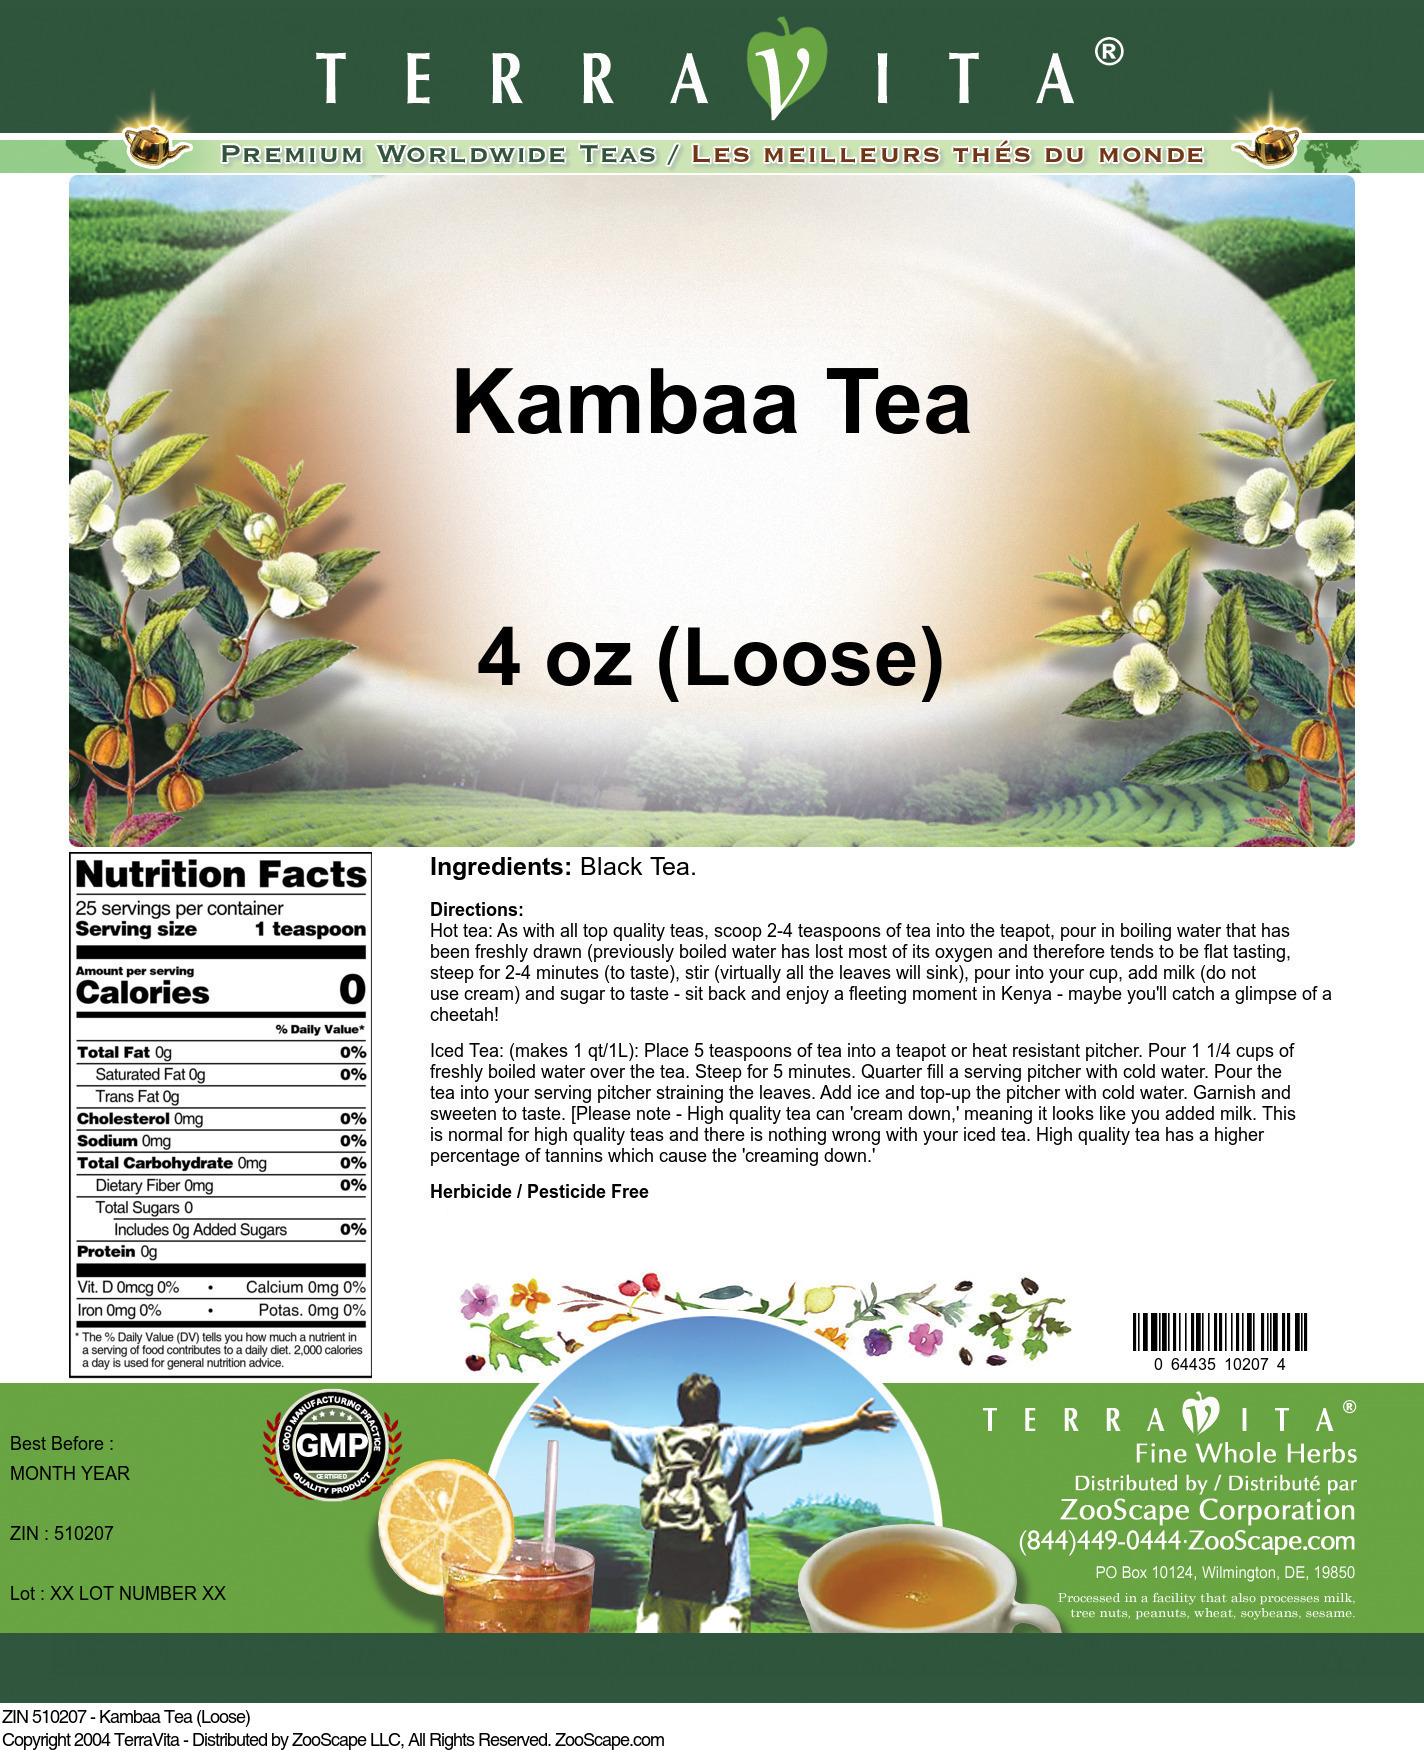 Kambaa Tea (Loose)